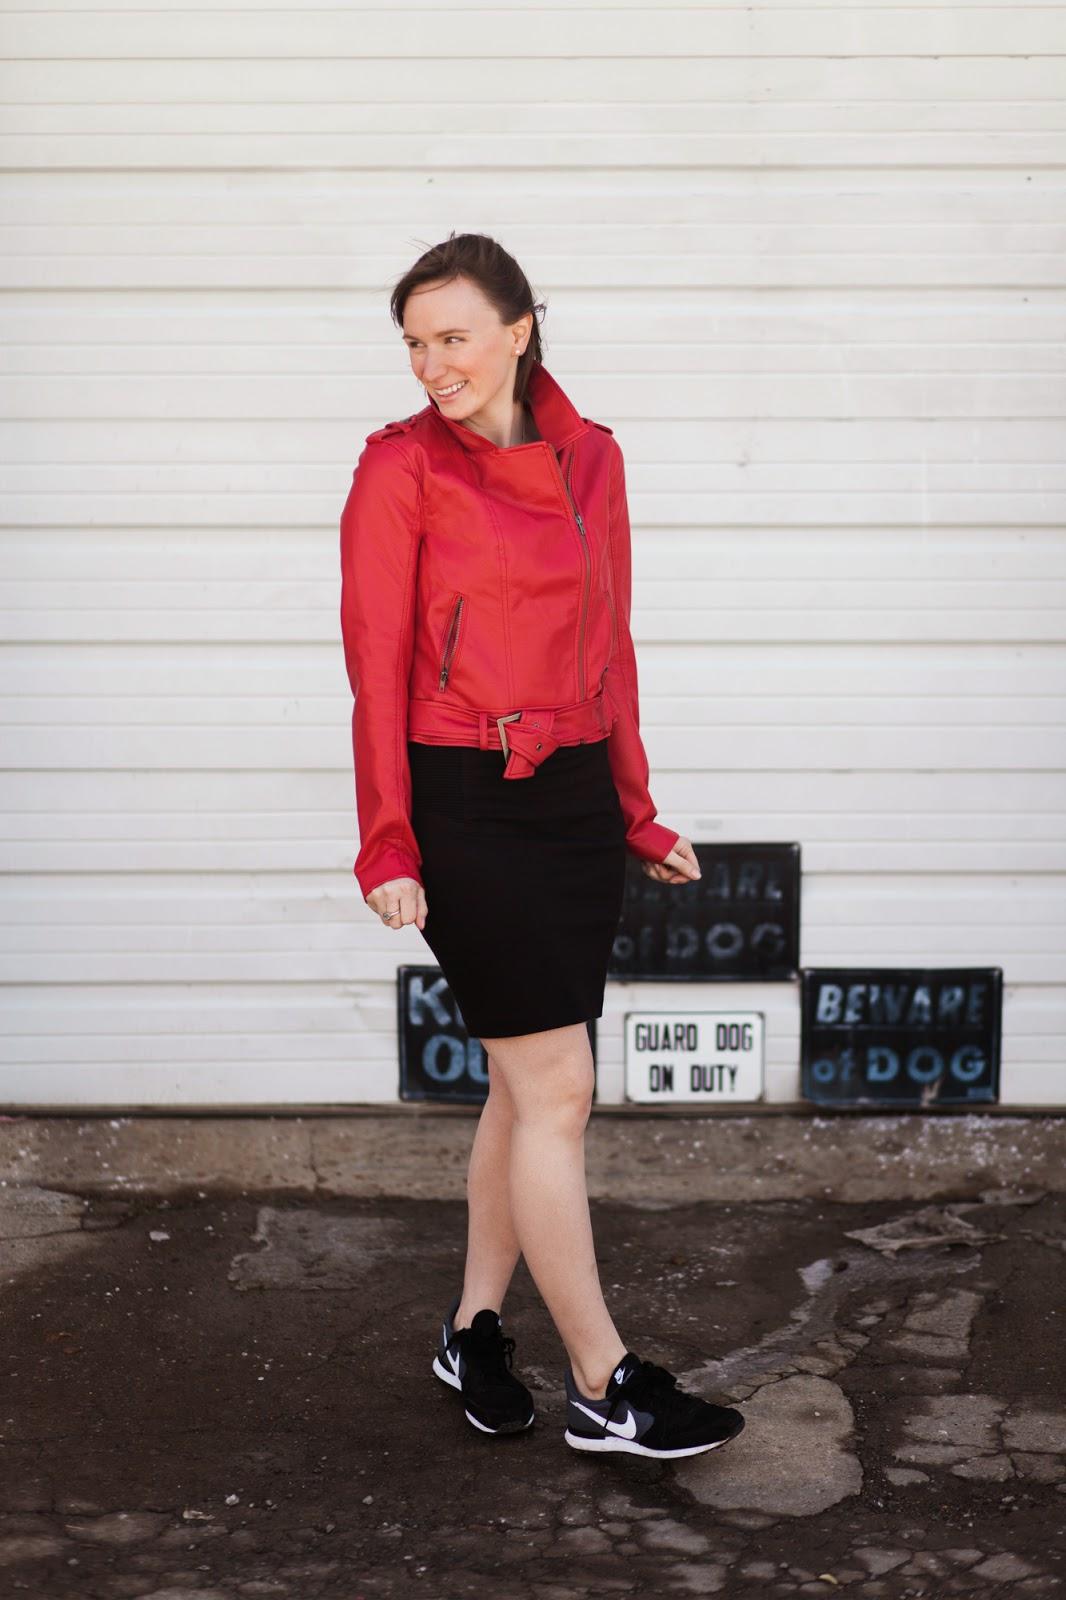 Red Leather Jacket, Nike Internationalist Sneaker, Nashville Style, Casual Work Look